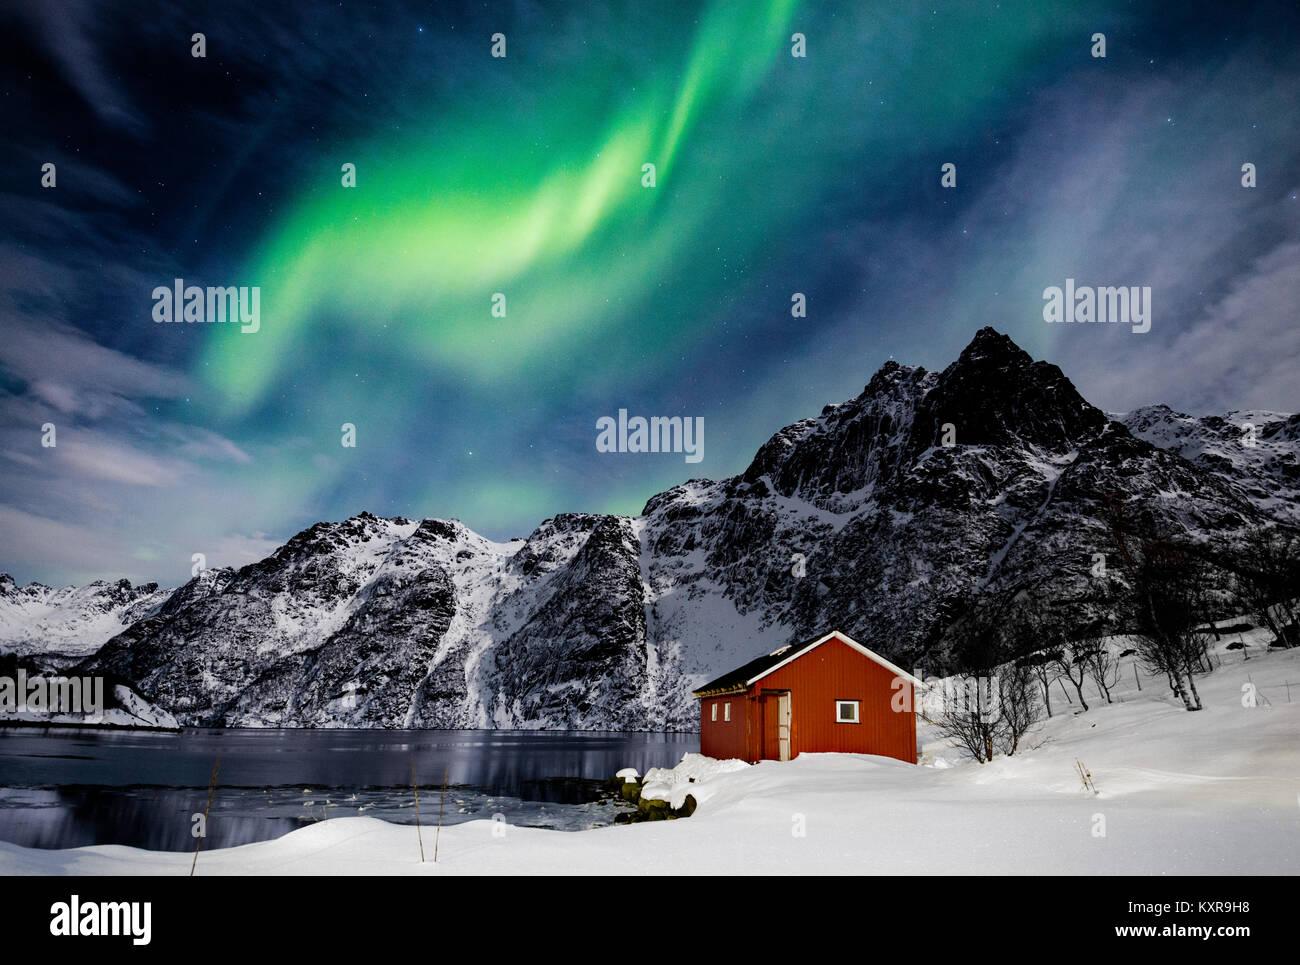 Lofoten, Svolvaer, Aurora Borealis over a frozen lake and red rorbu, Norway. Stock Photo